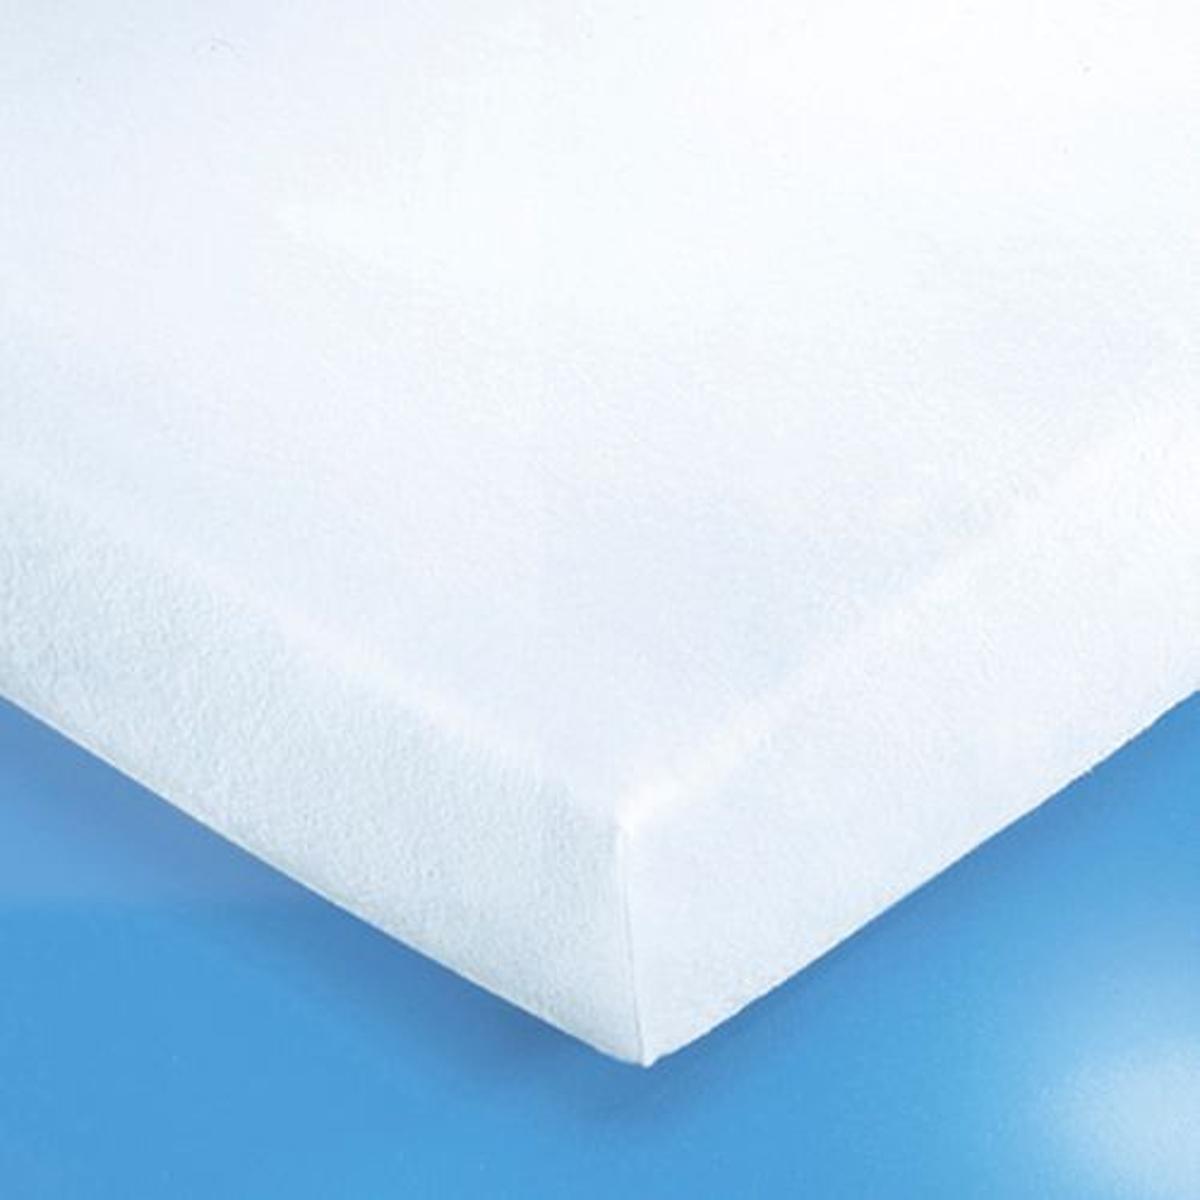 Protège-matelas forme housse anti punaises de lit